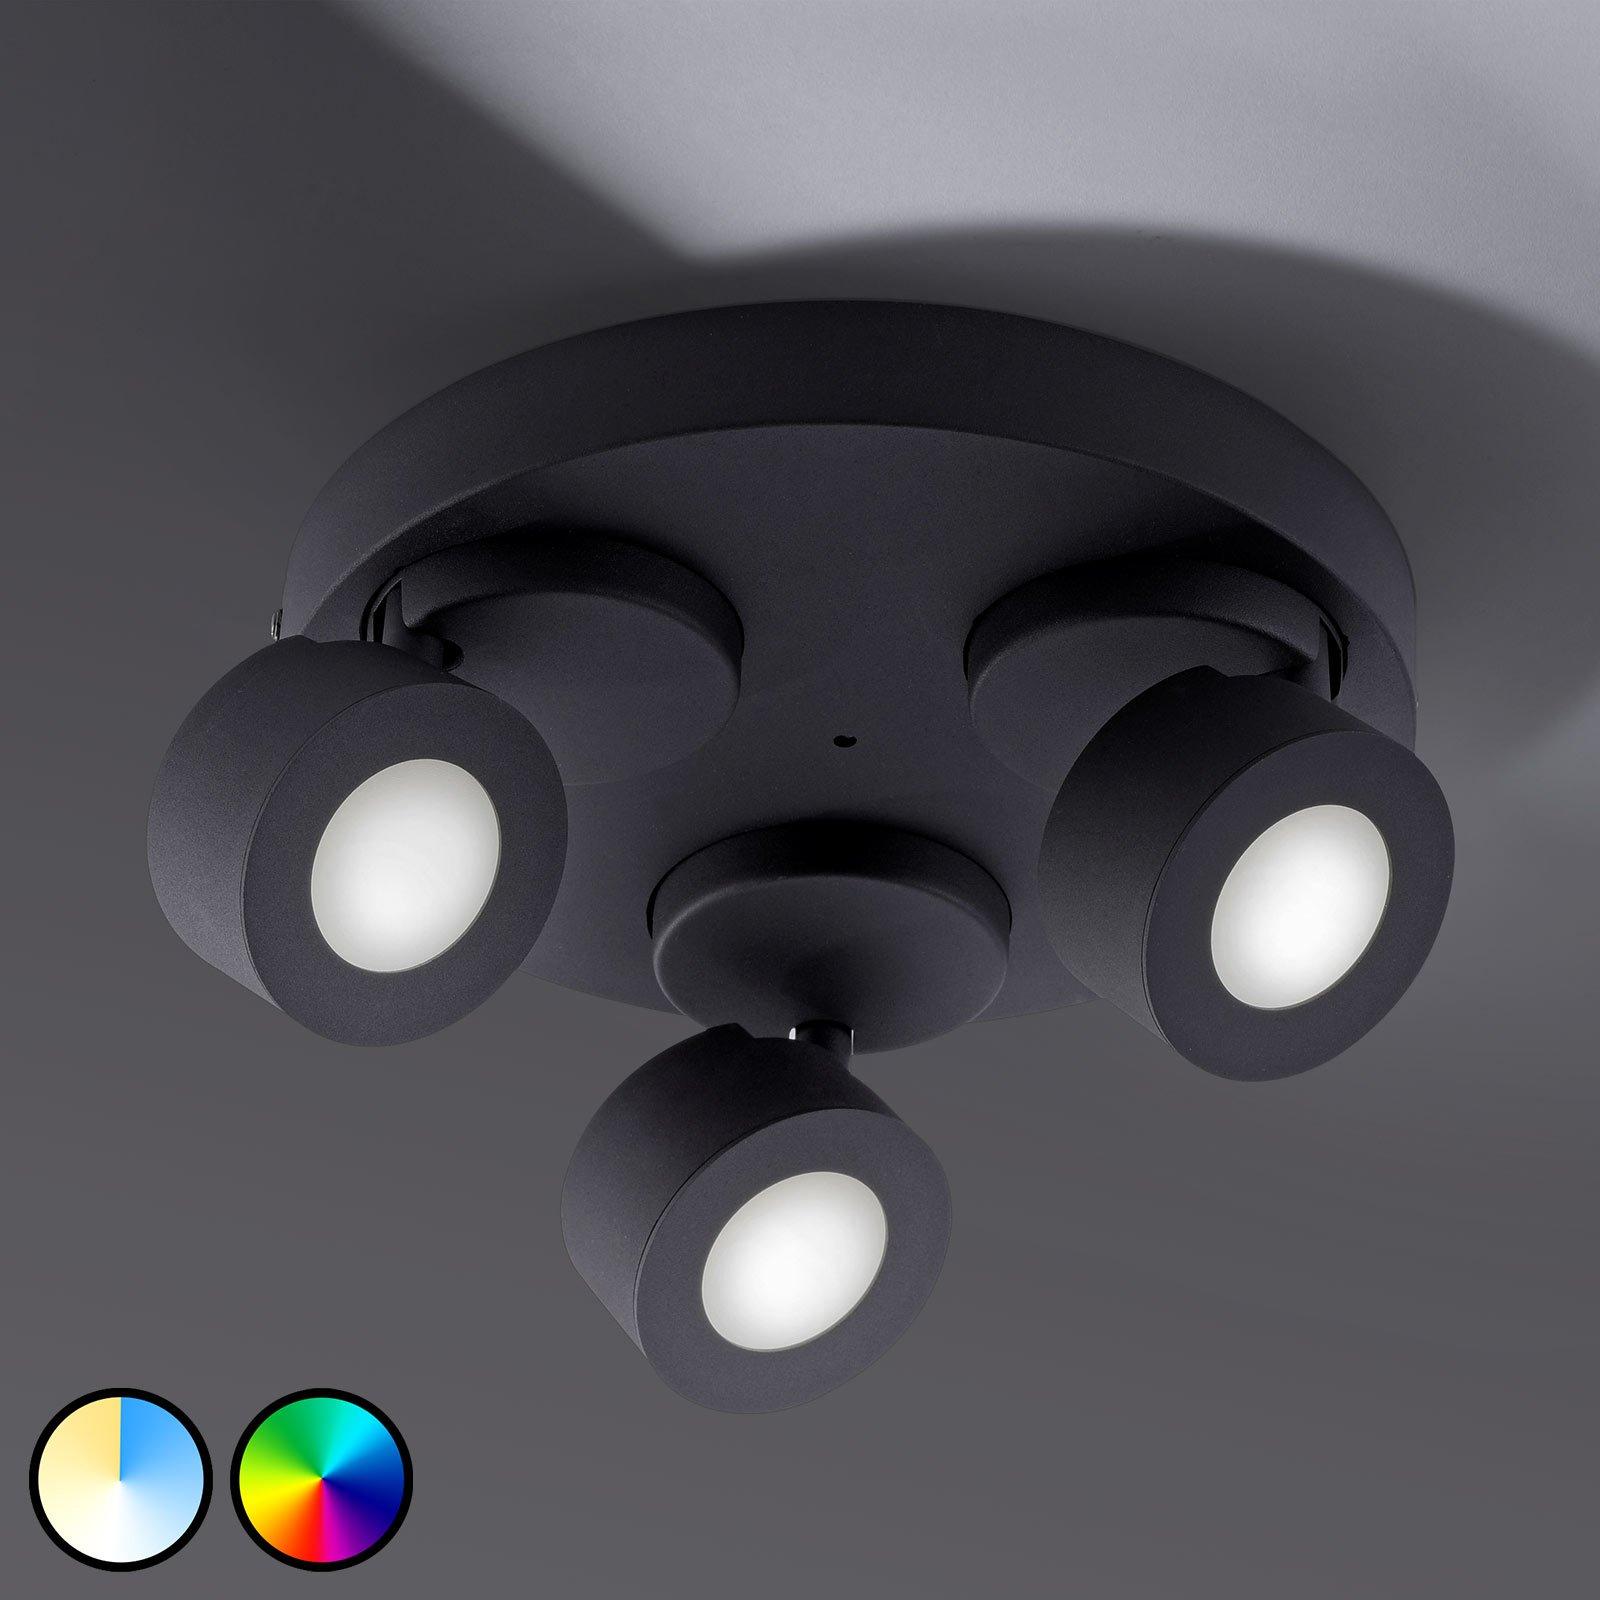 Trio WiZ Sancho LED-taklampe, 3 lyskilder, svart